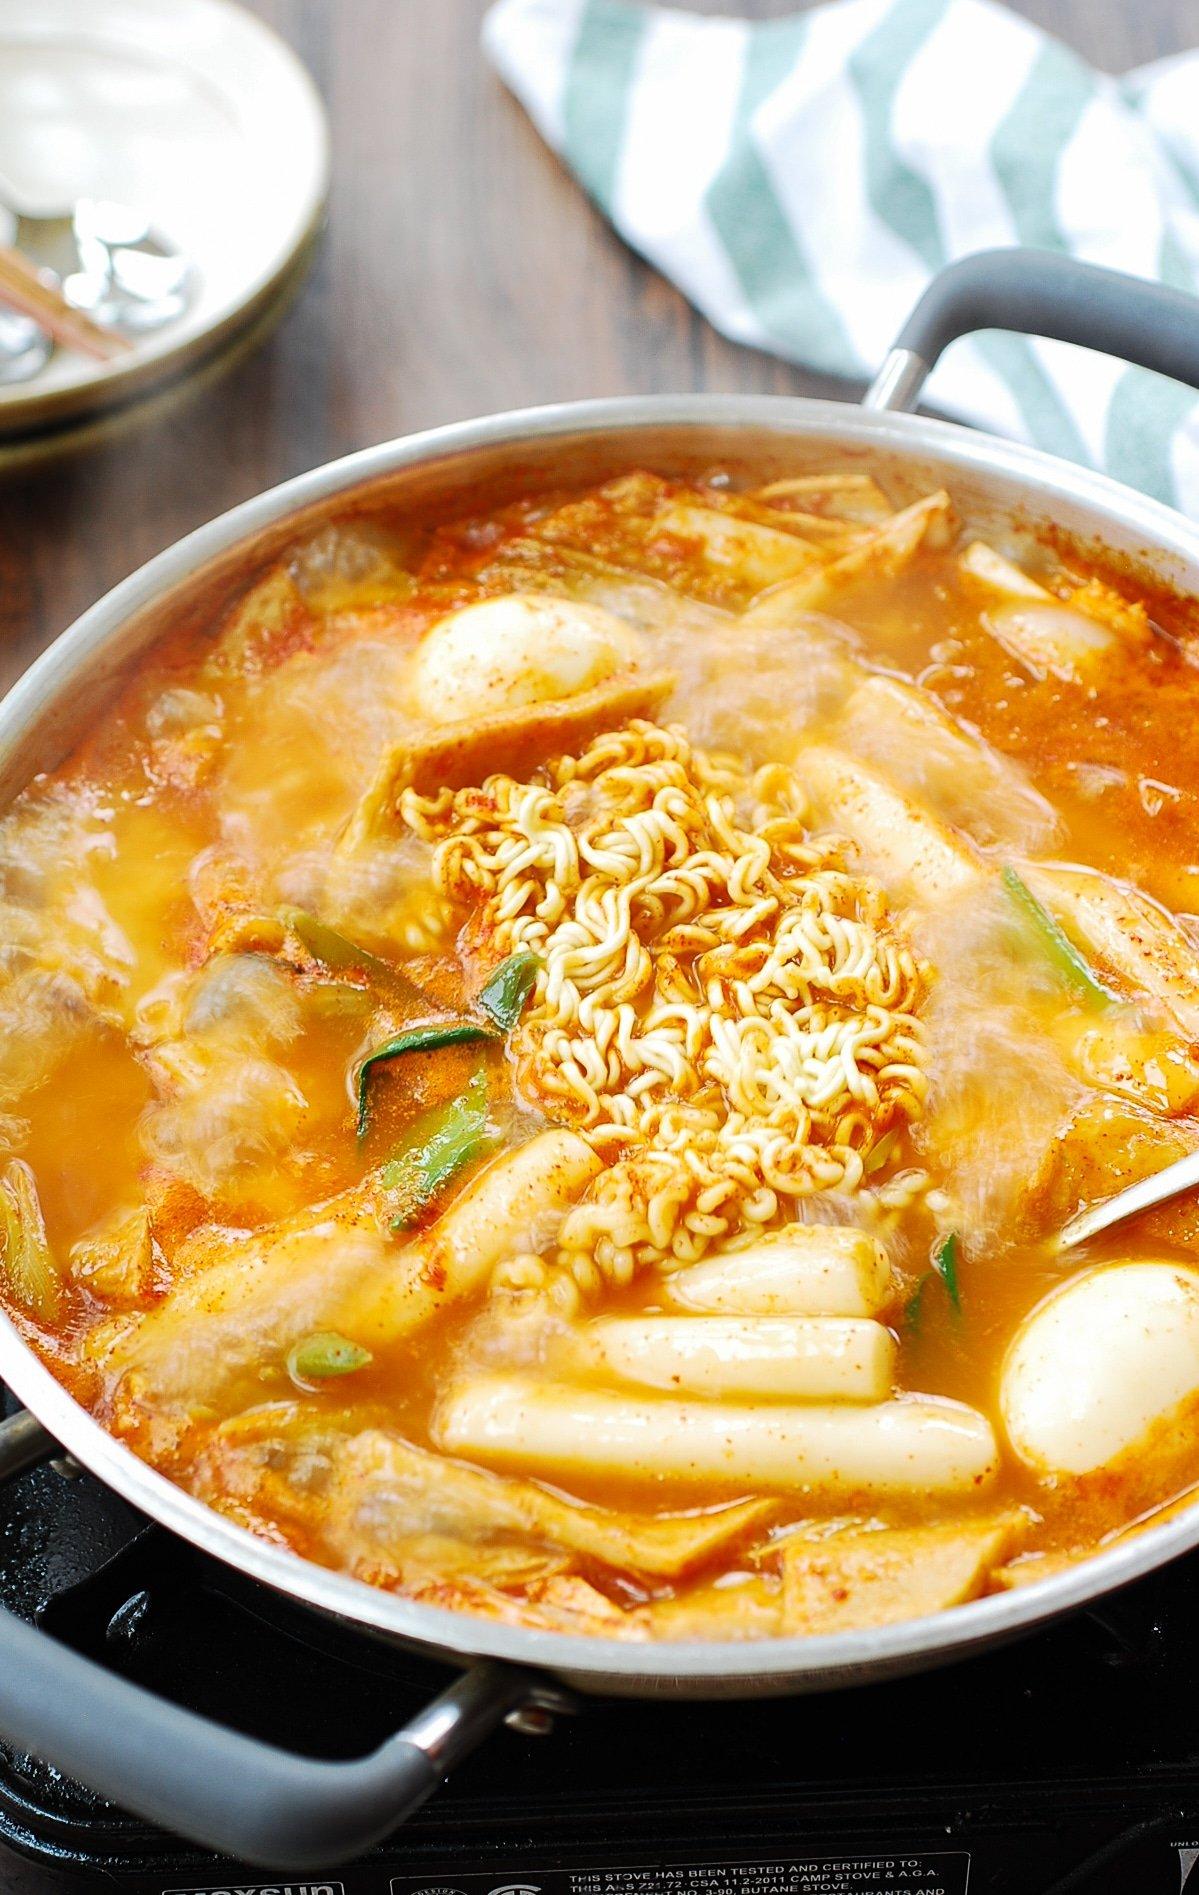 DSC 1826 - Soupy Tteokbokki (Spicy Braised Rice Cake)